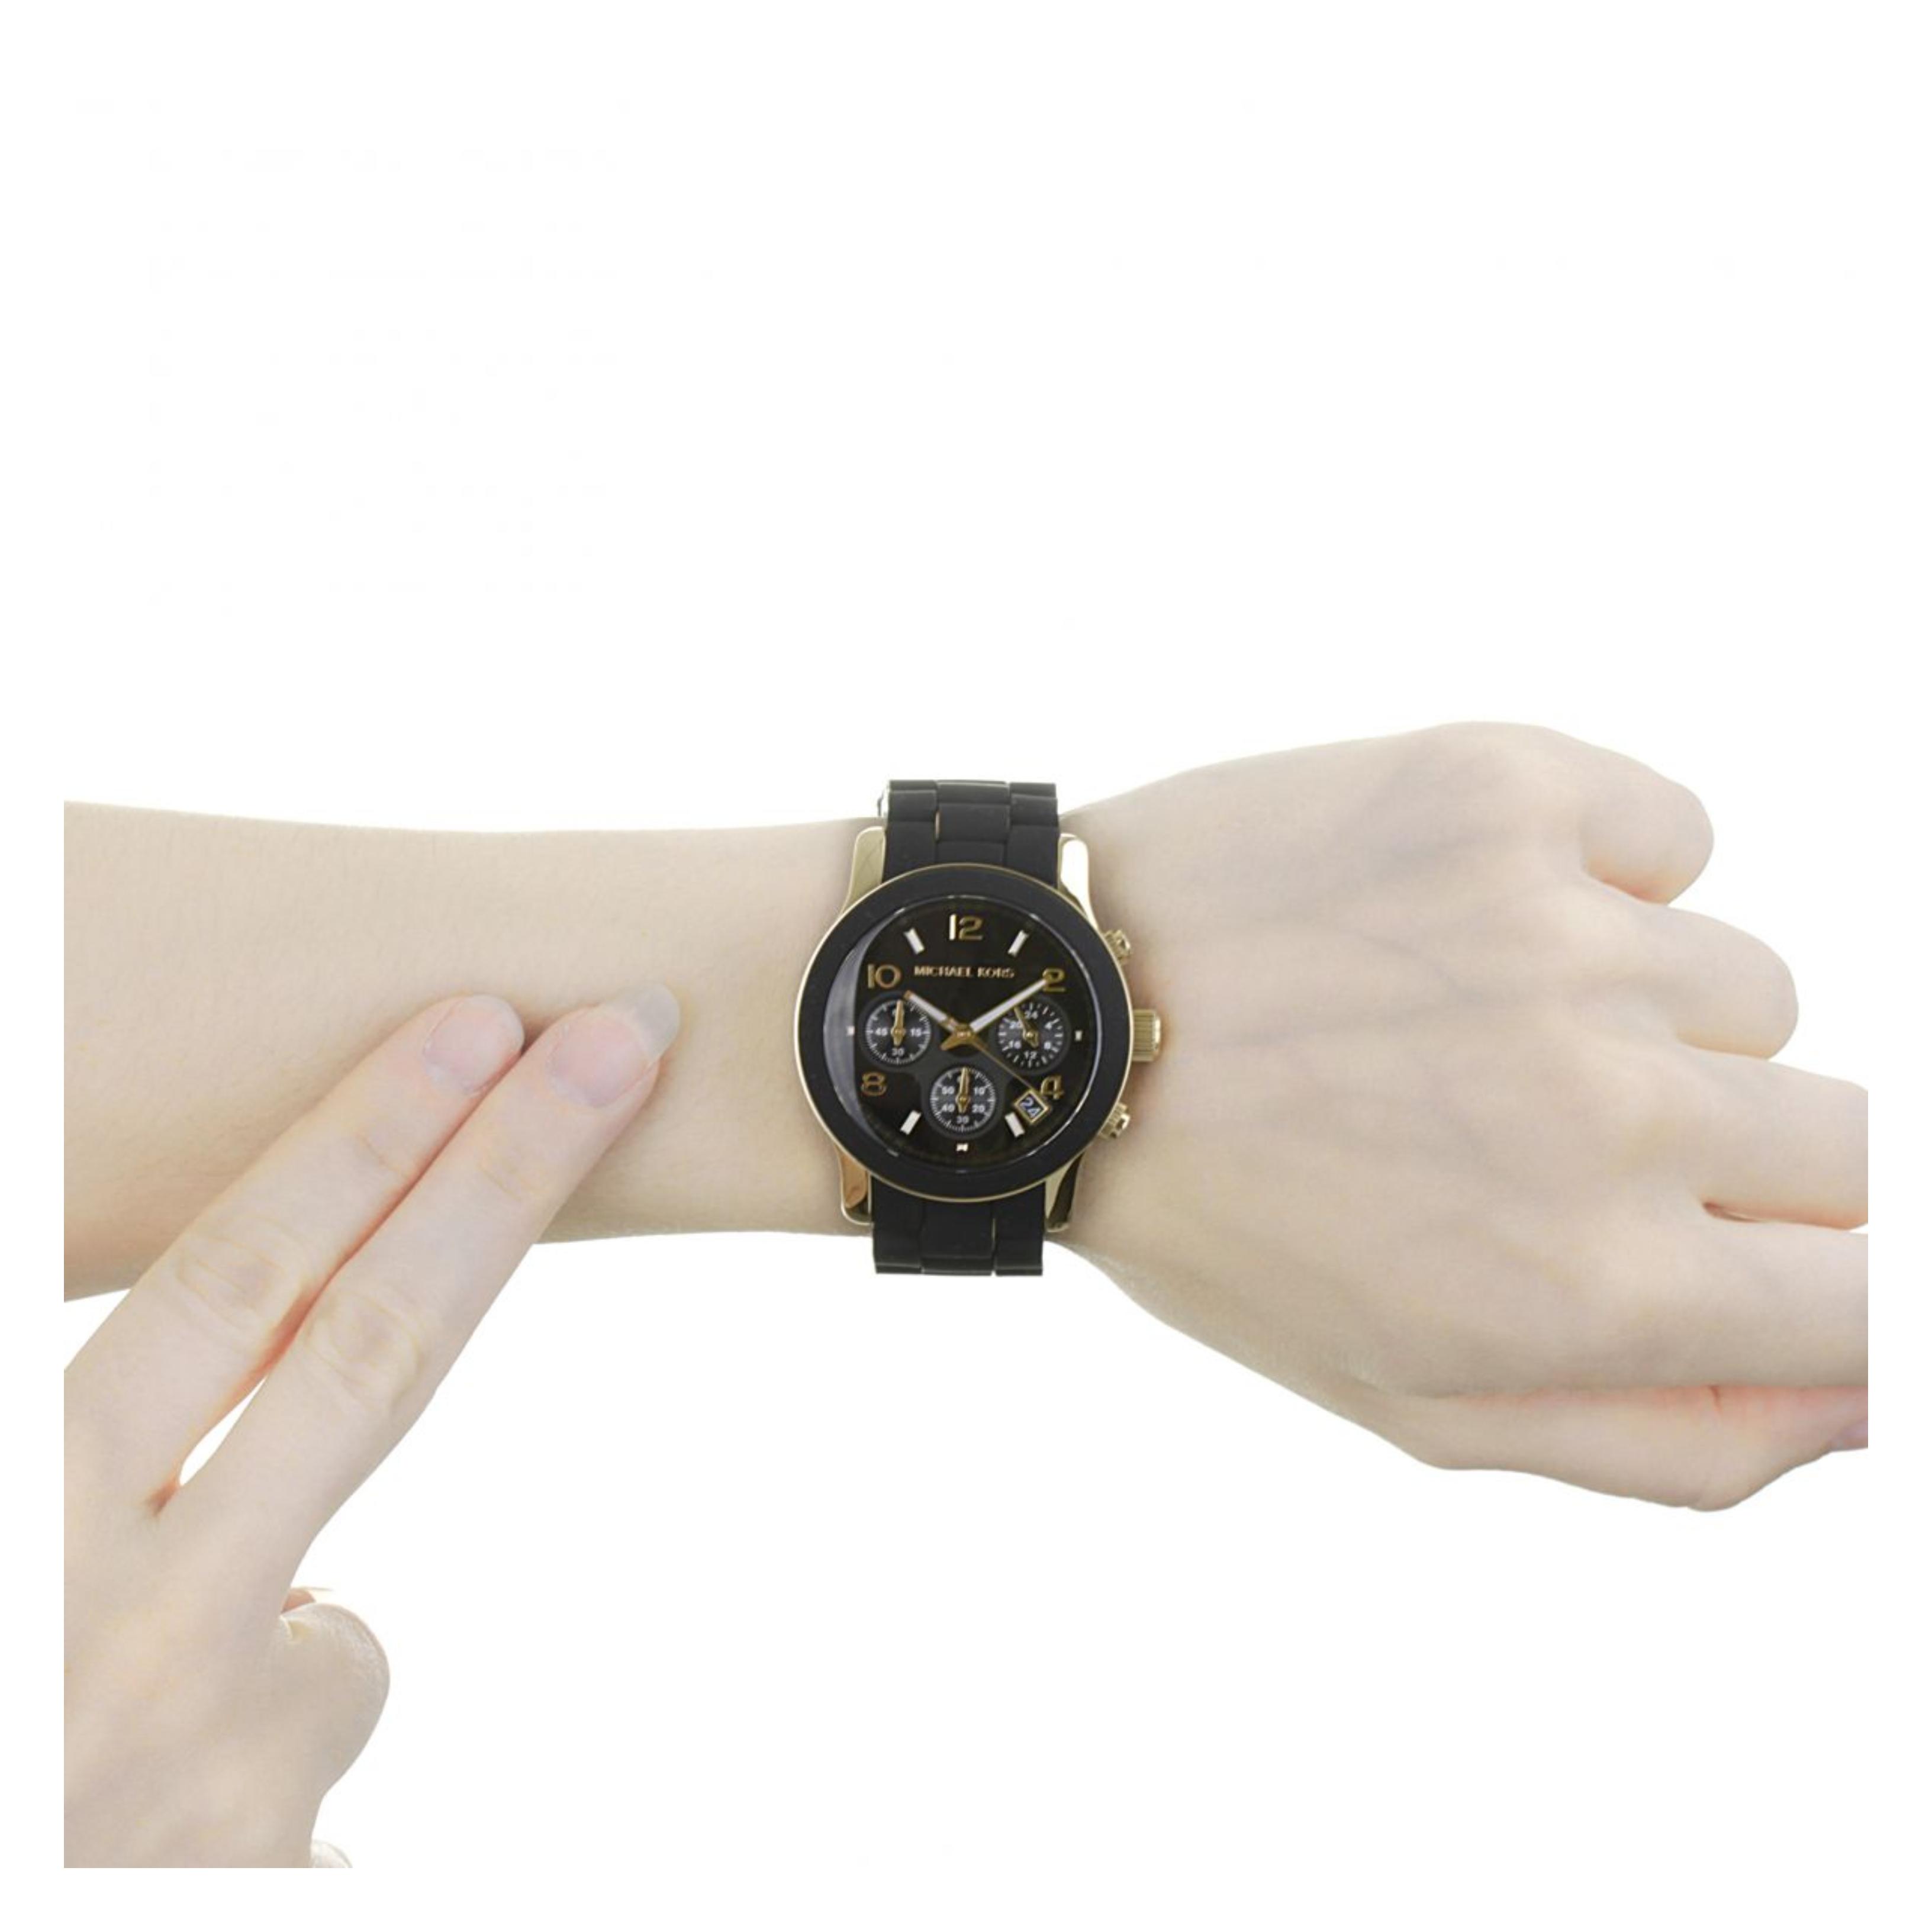 428098373b10a Sentinel Michael Kors Runway Women s Watch│Chronograph Black Dial│Bracelet  Band│MK5191